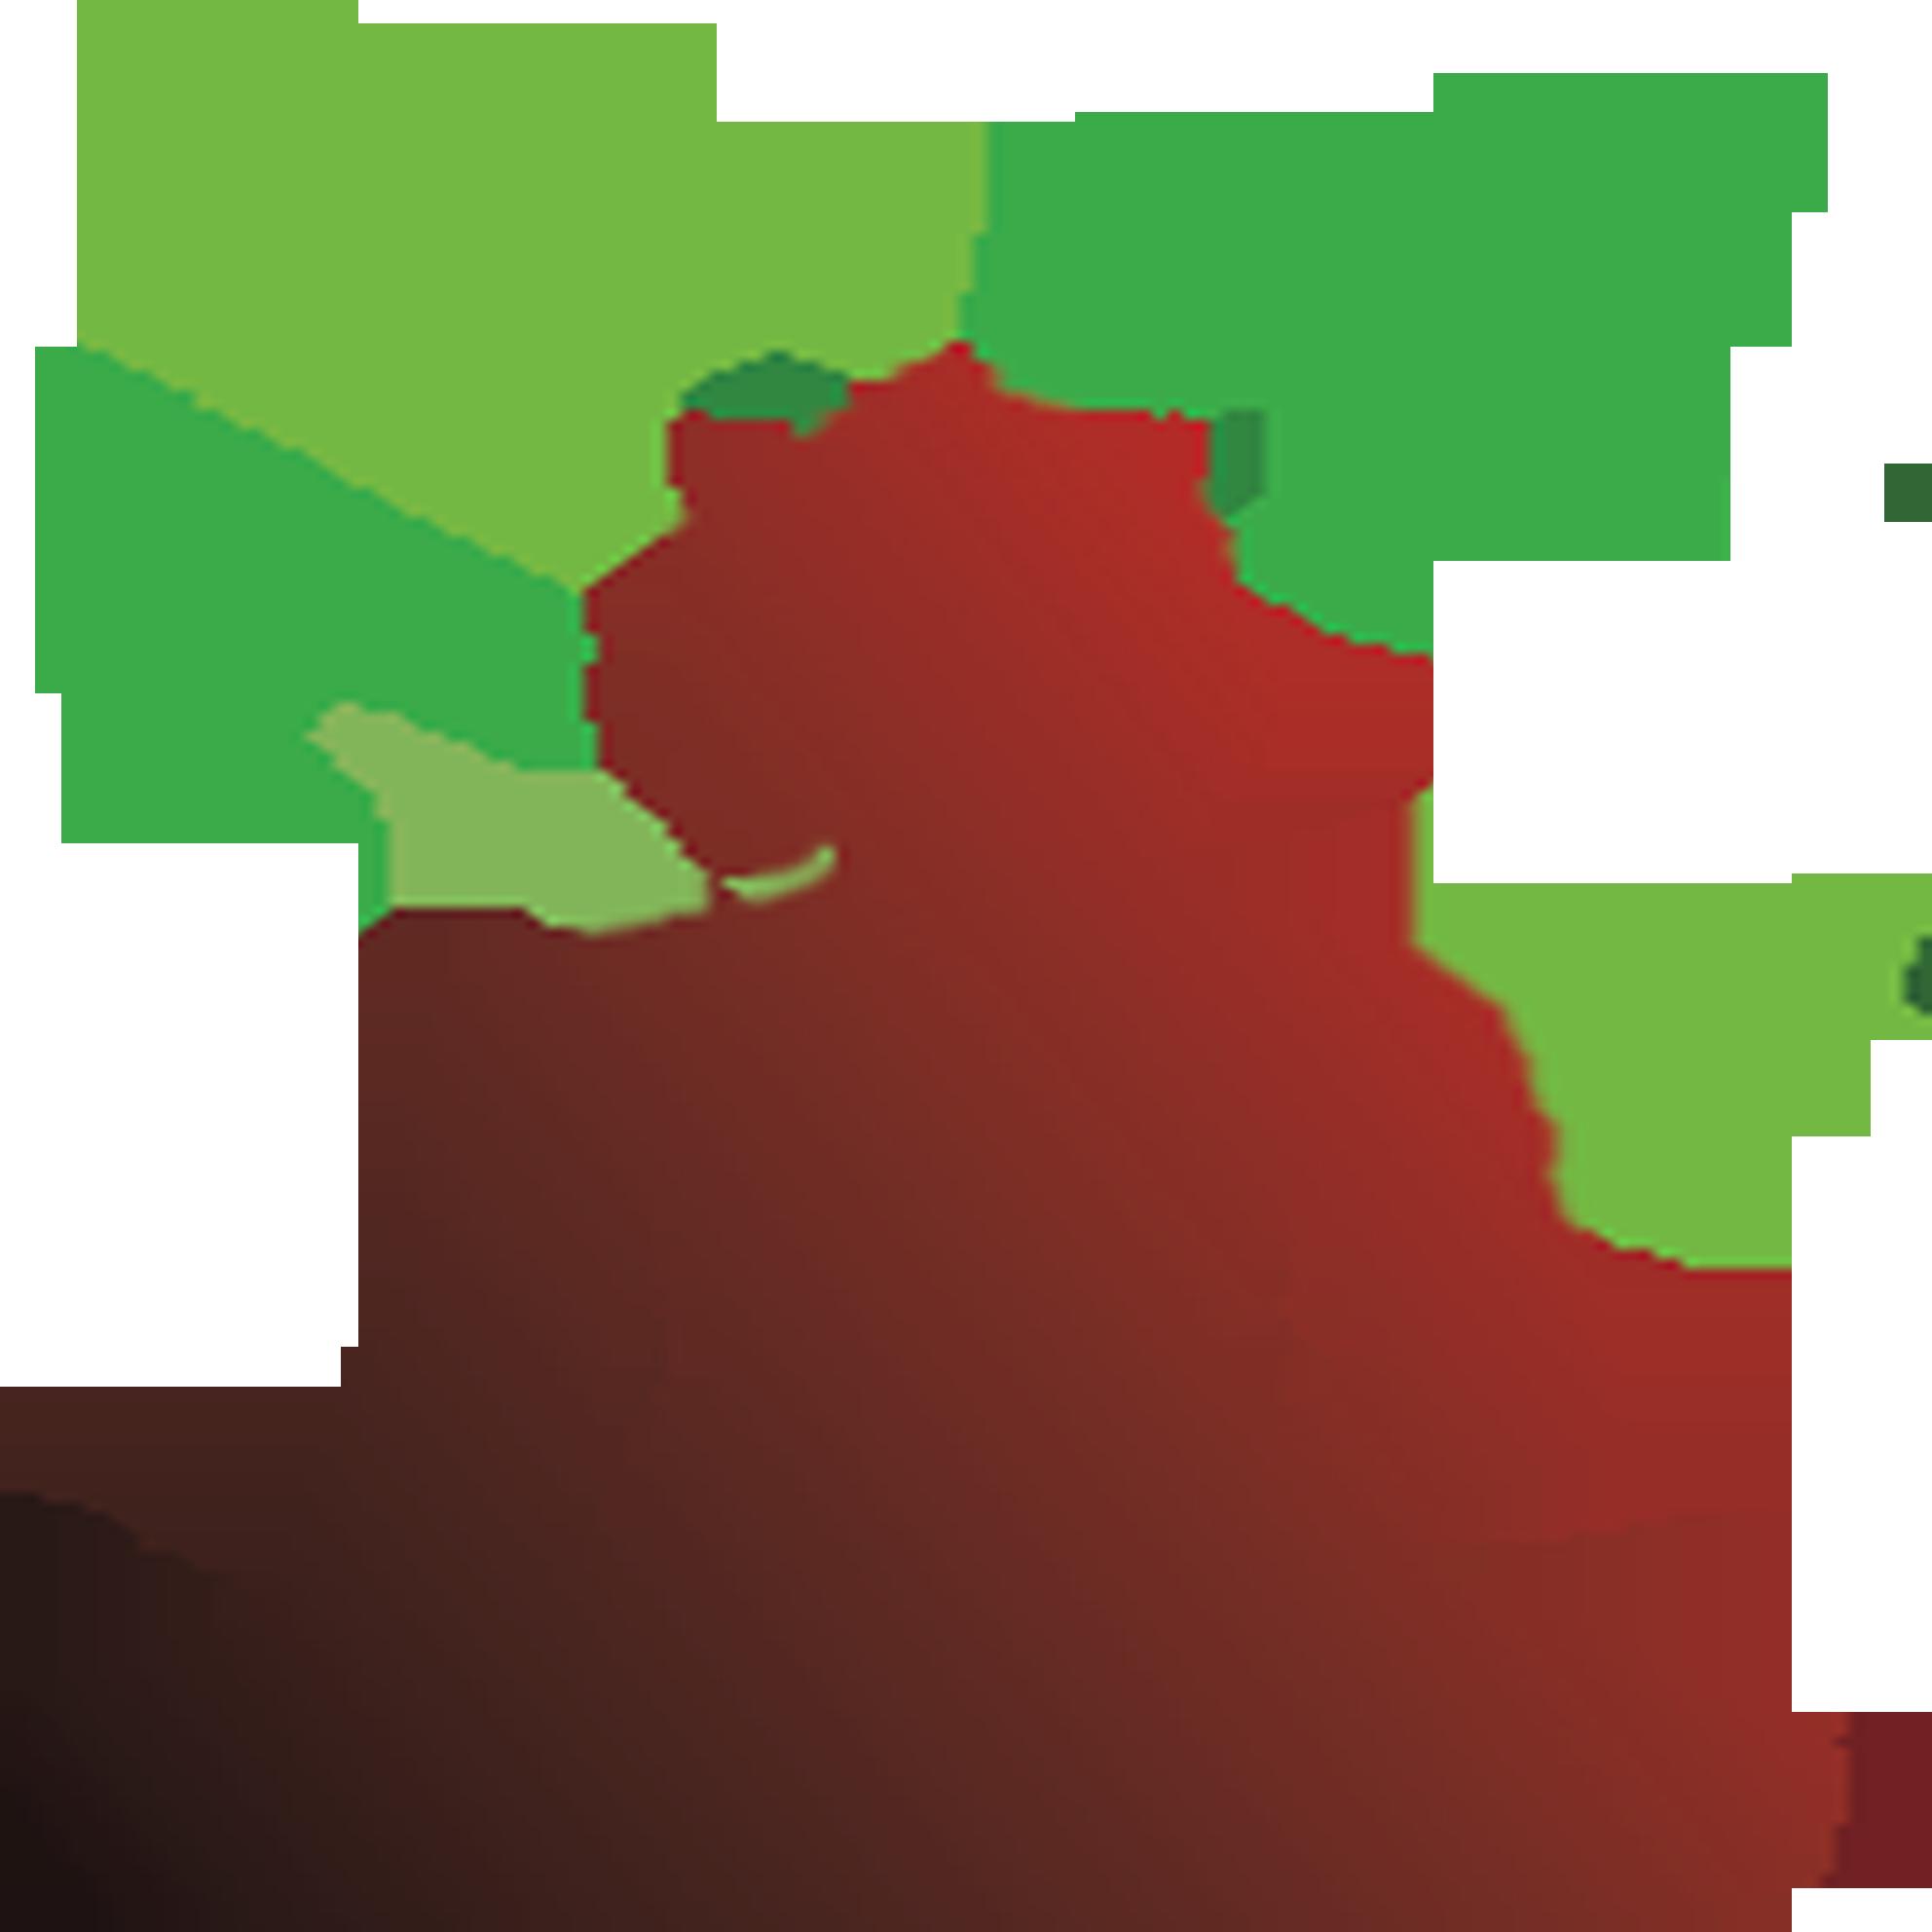 Clipart park jhula. About us rishikesh yogi